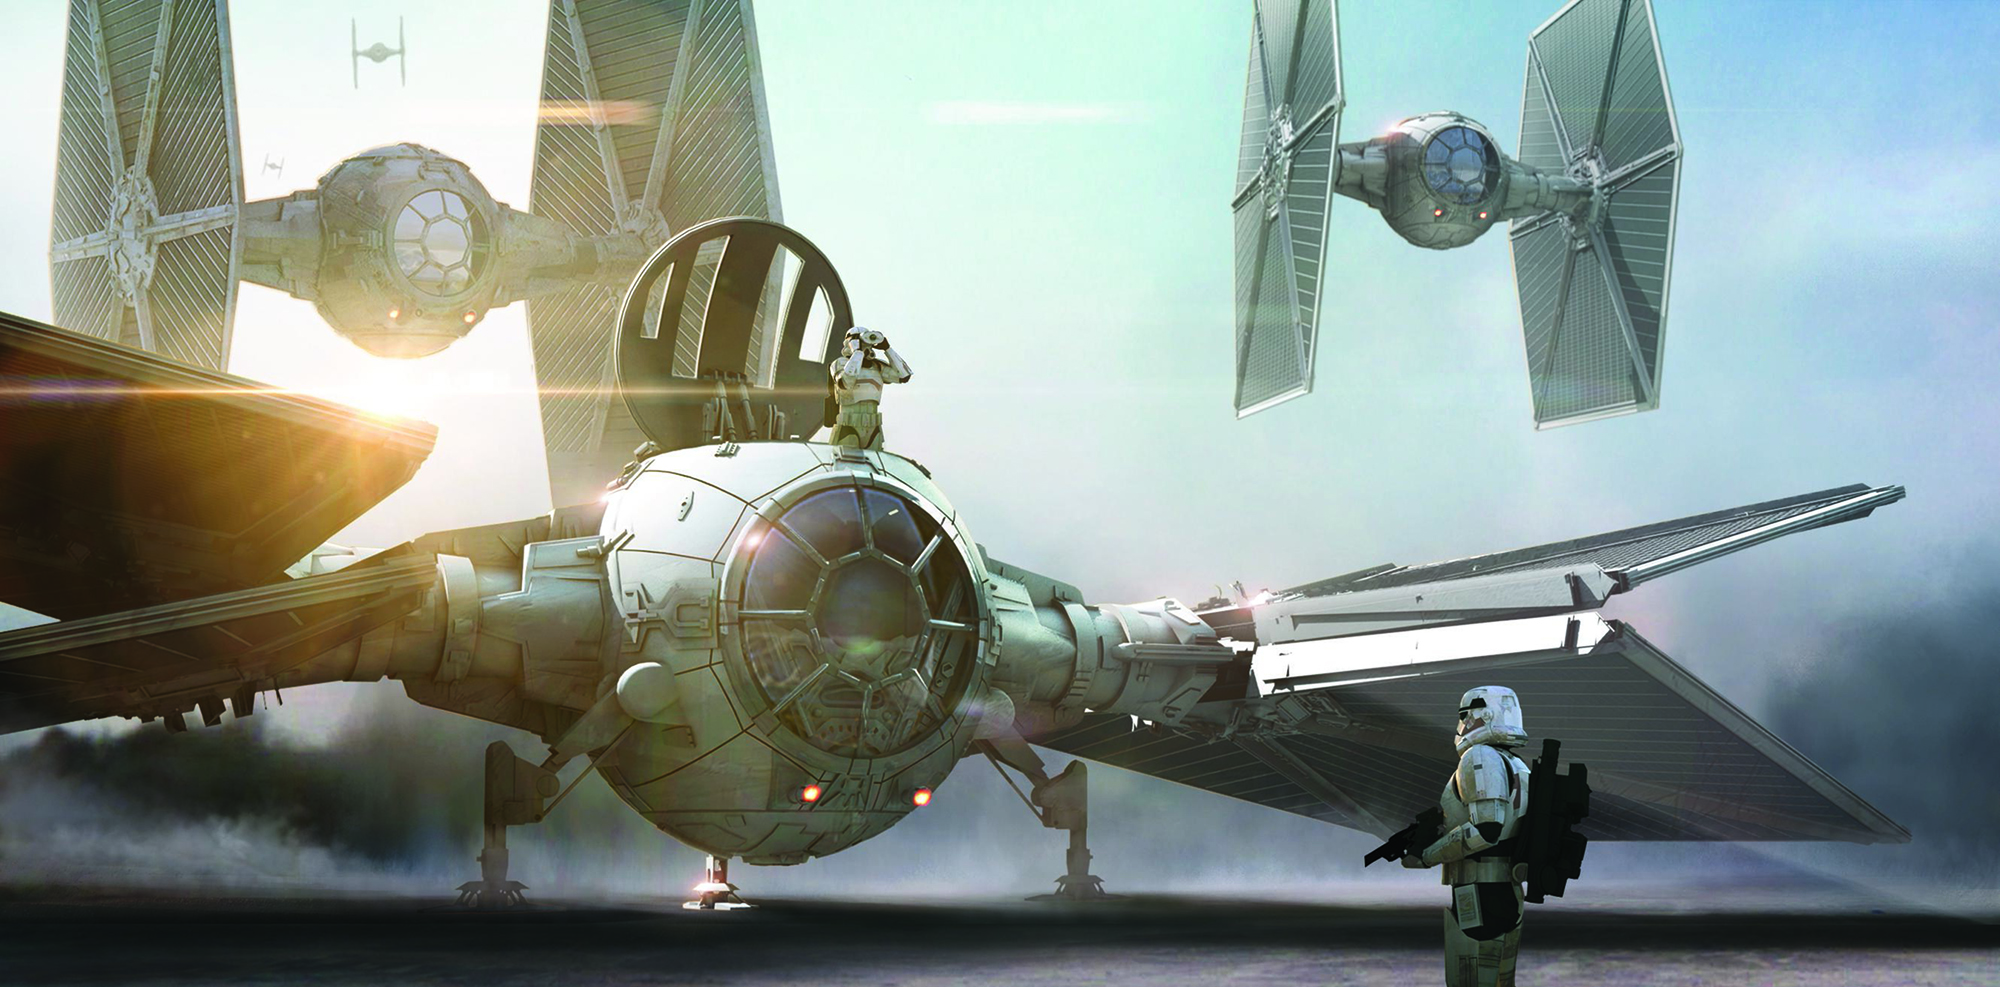 Star Wars: The Force Awakens..Conceptual Artwork…Artist: Doug Chiang... © 2016 Lucasfilm Ltd.